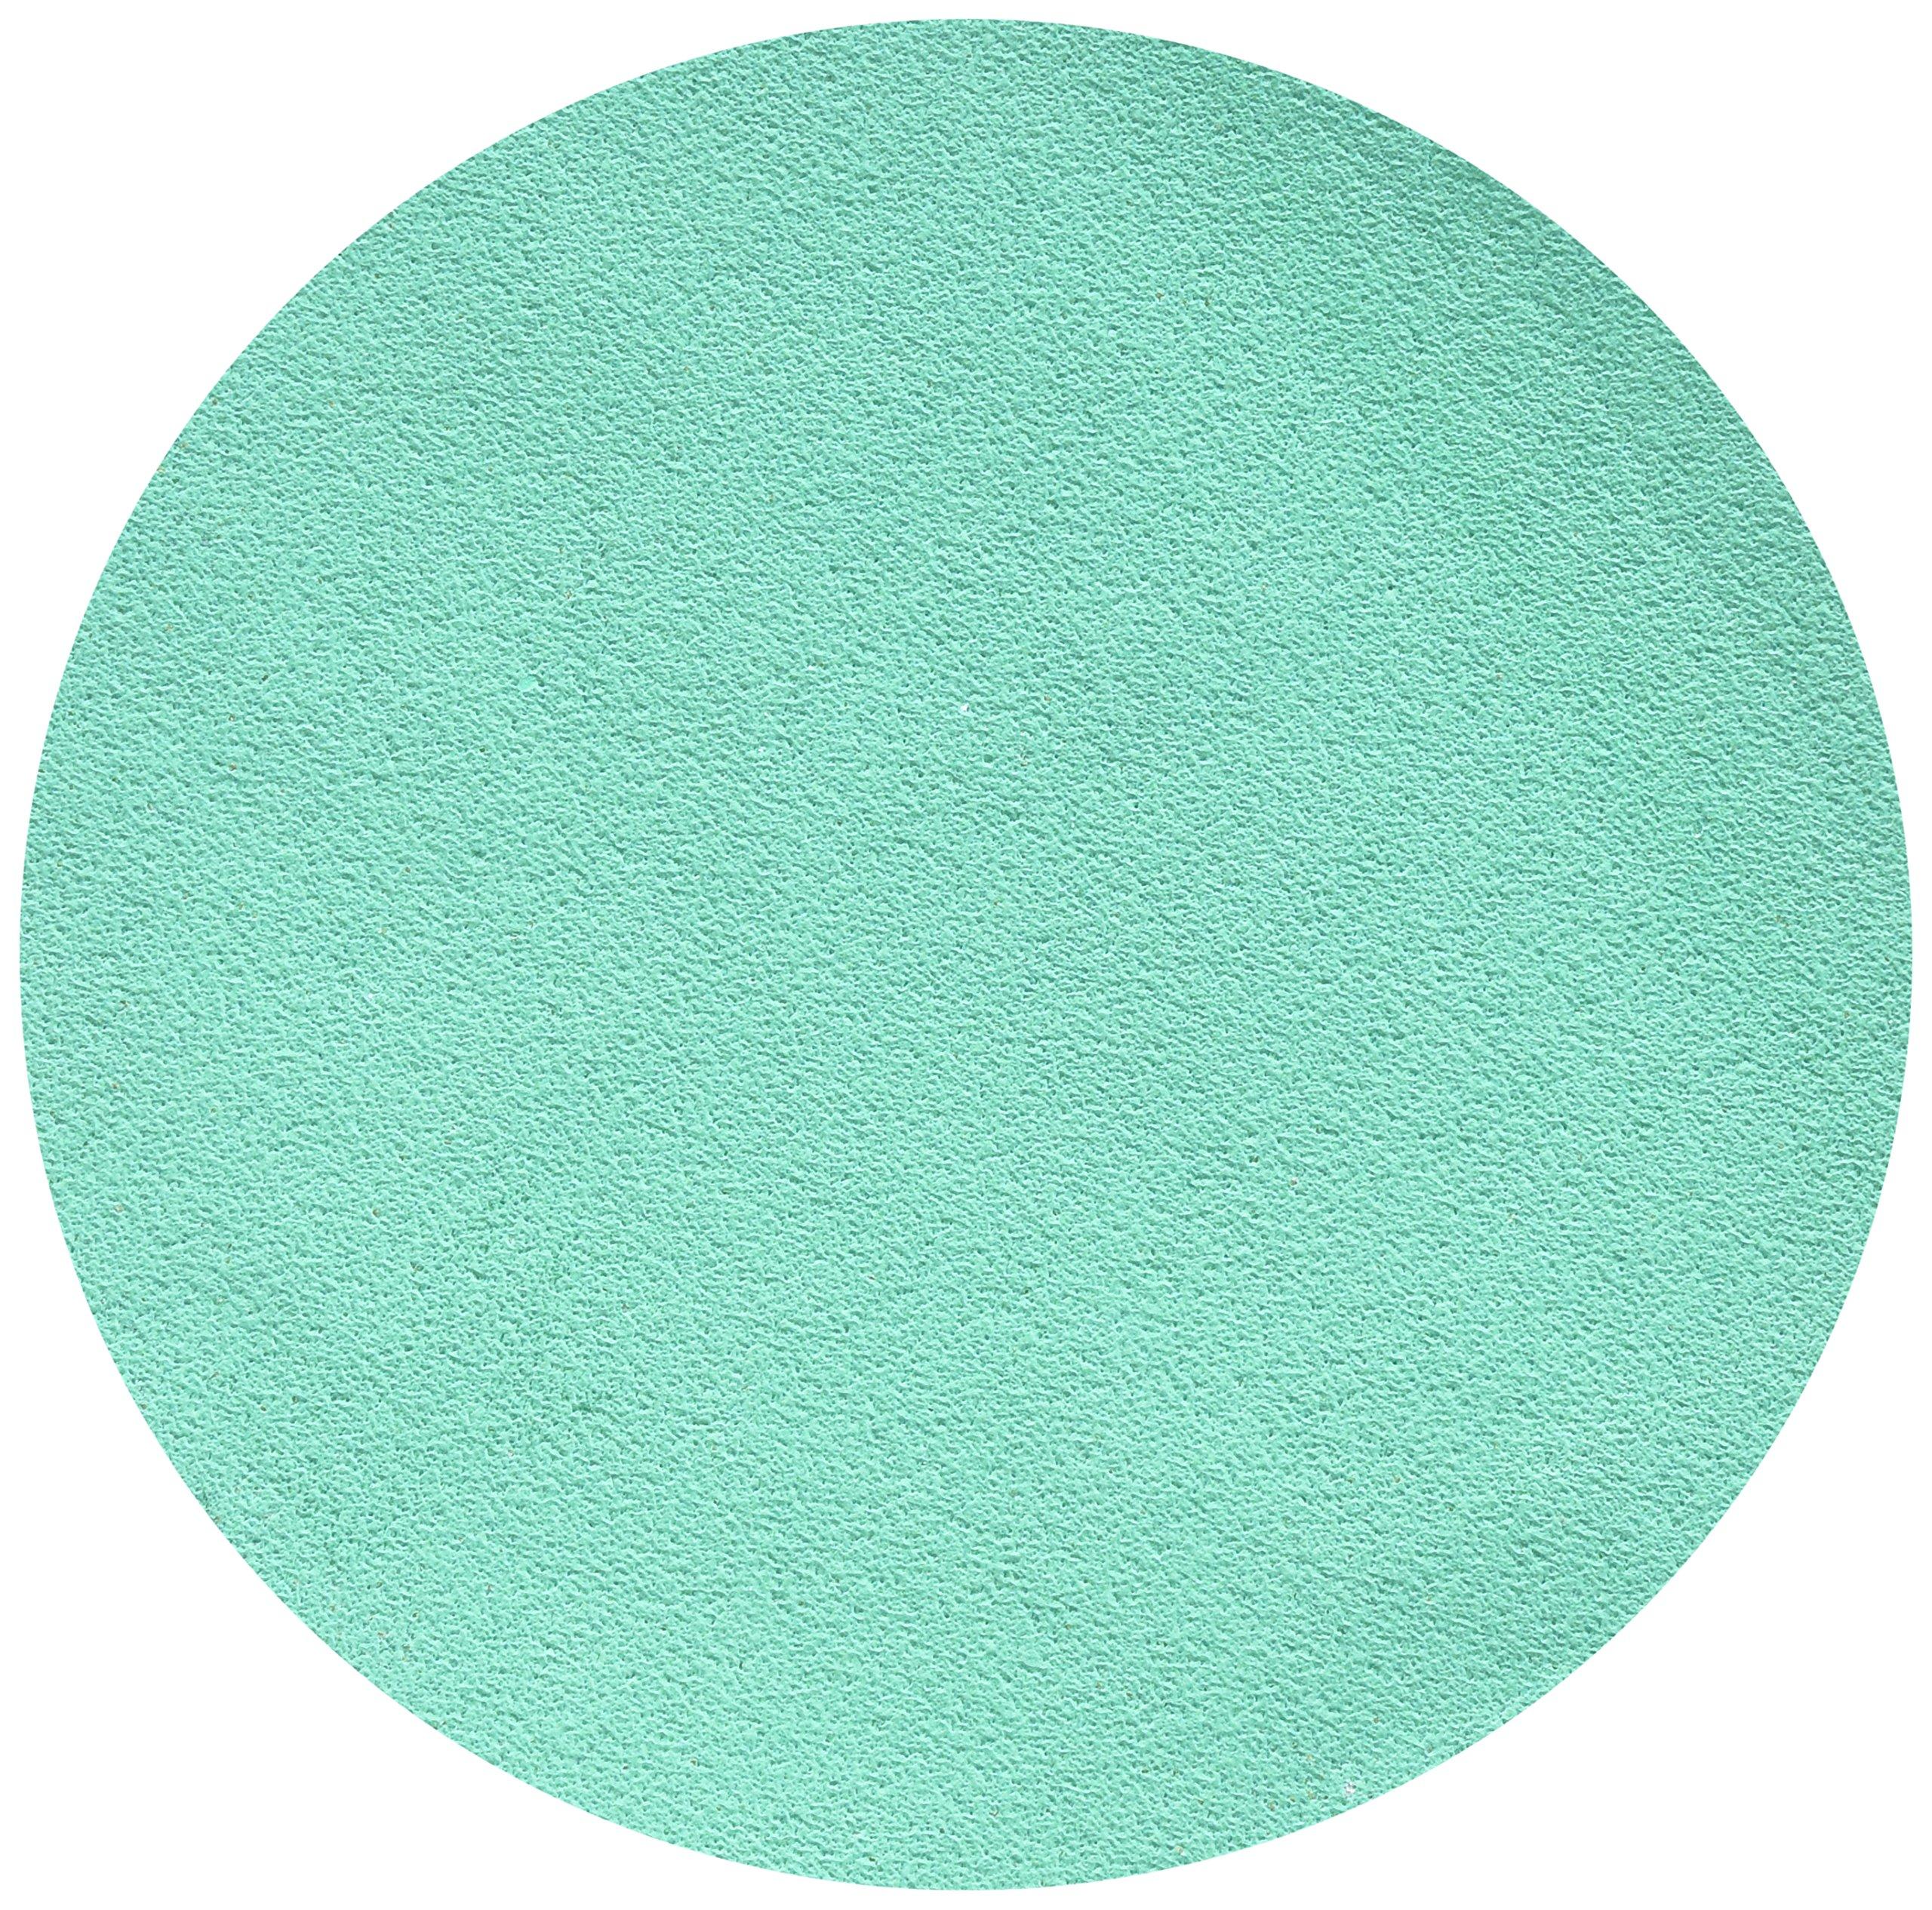 3M 01506 Stikit Green 6'' 80D Grit Fre-Cut Disc Roll